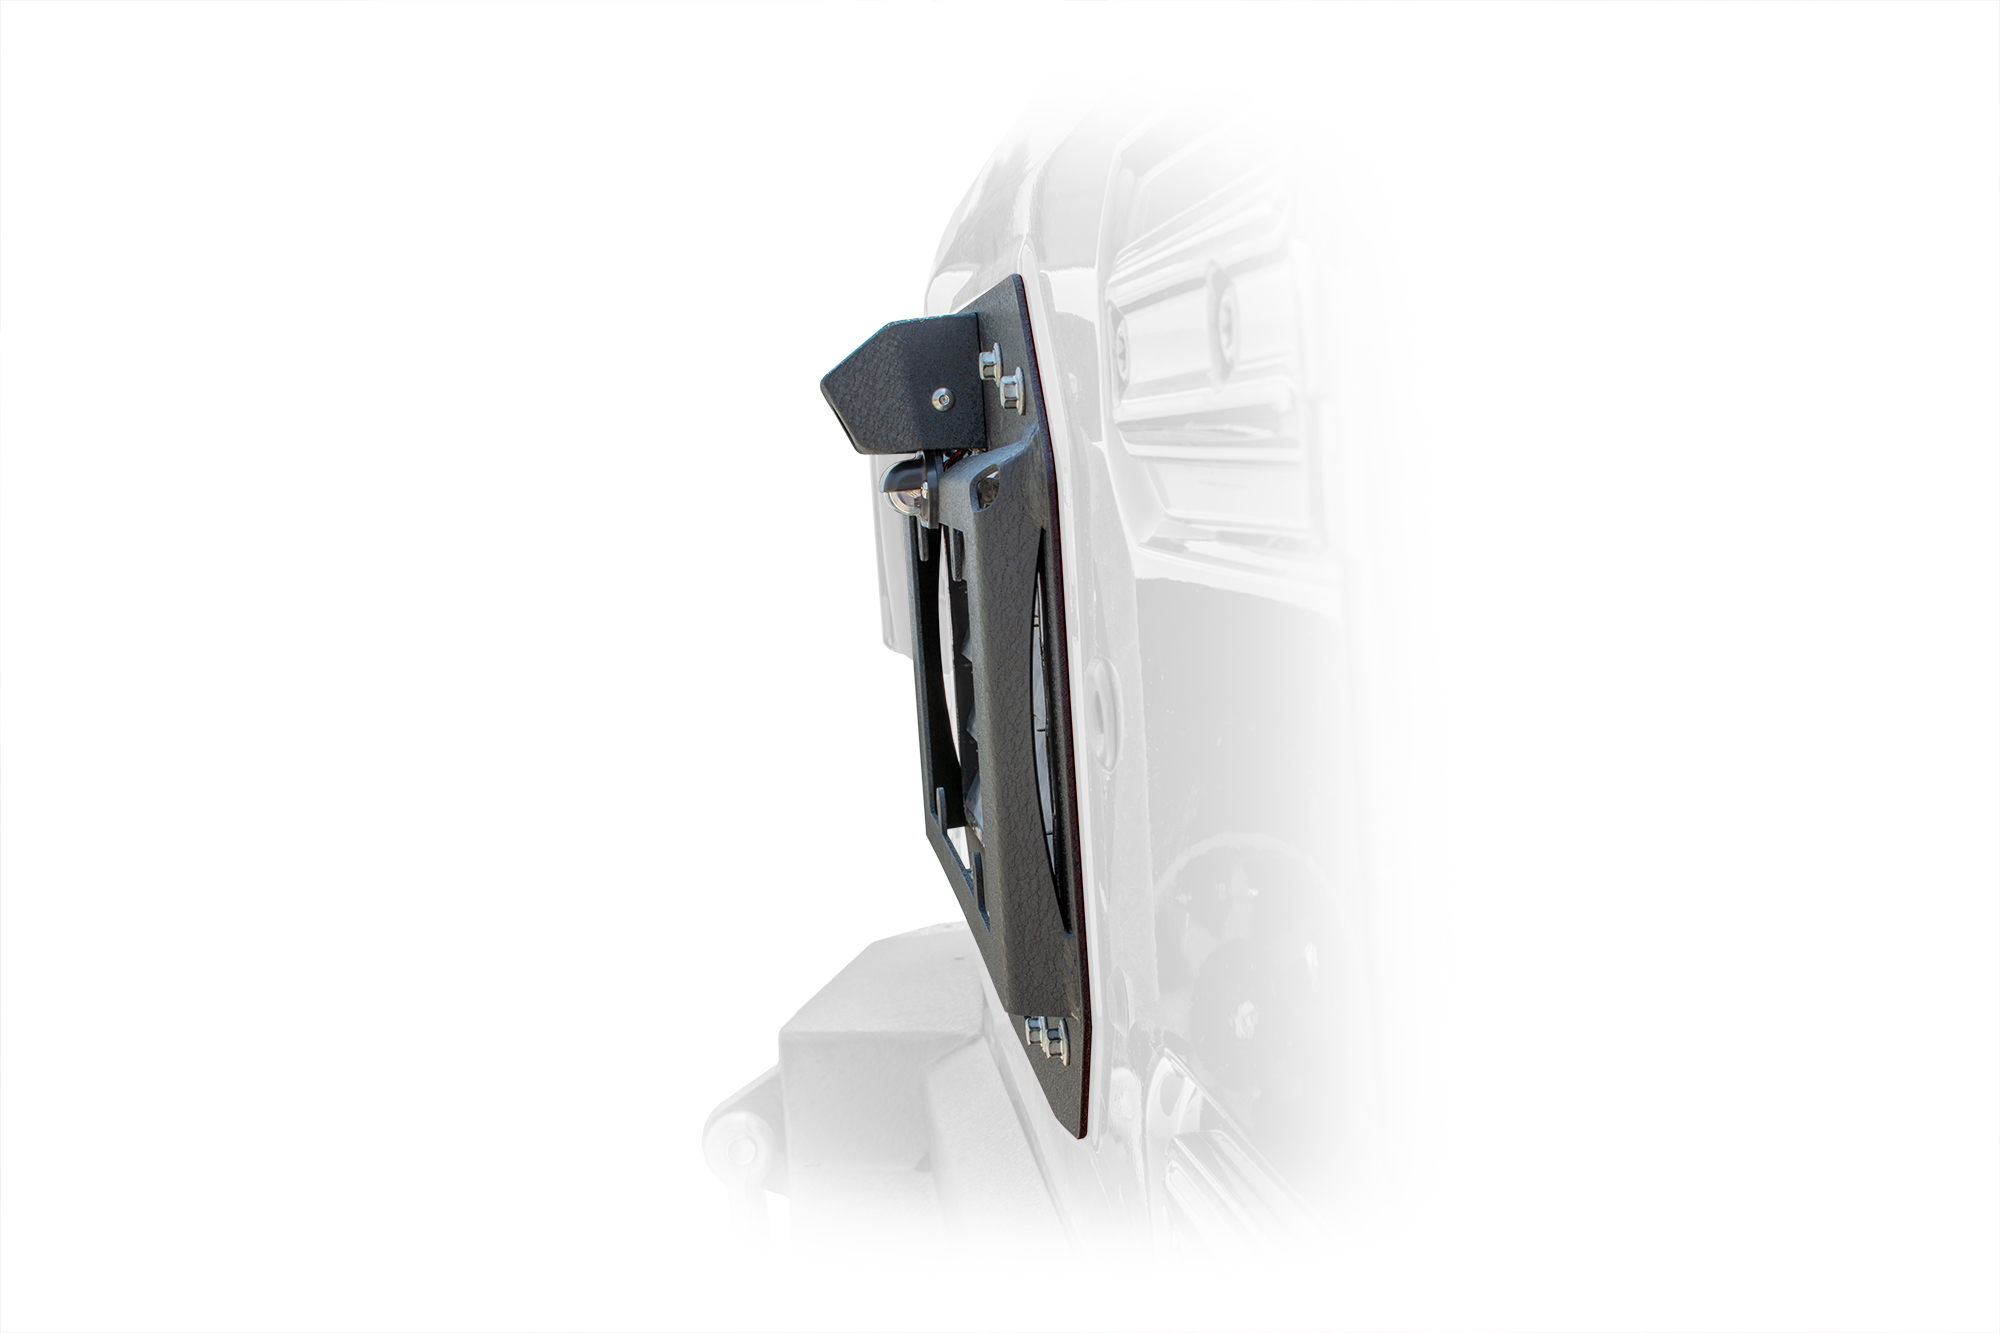 Jeep JL Spare Tire Delete with Camera Mount 18-Present Wrangler JL DV8 Offroad